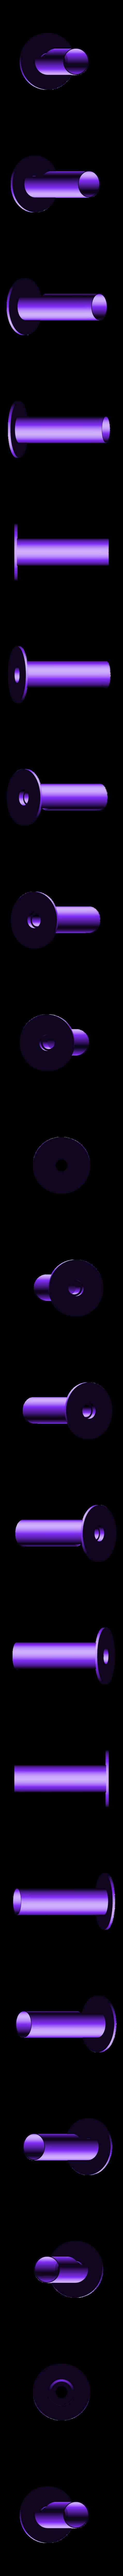 rotating_part.stl Download free STL file Paper towel man • Object to 3D print, Job